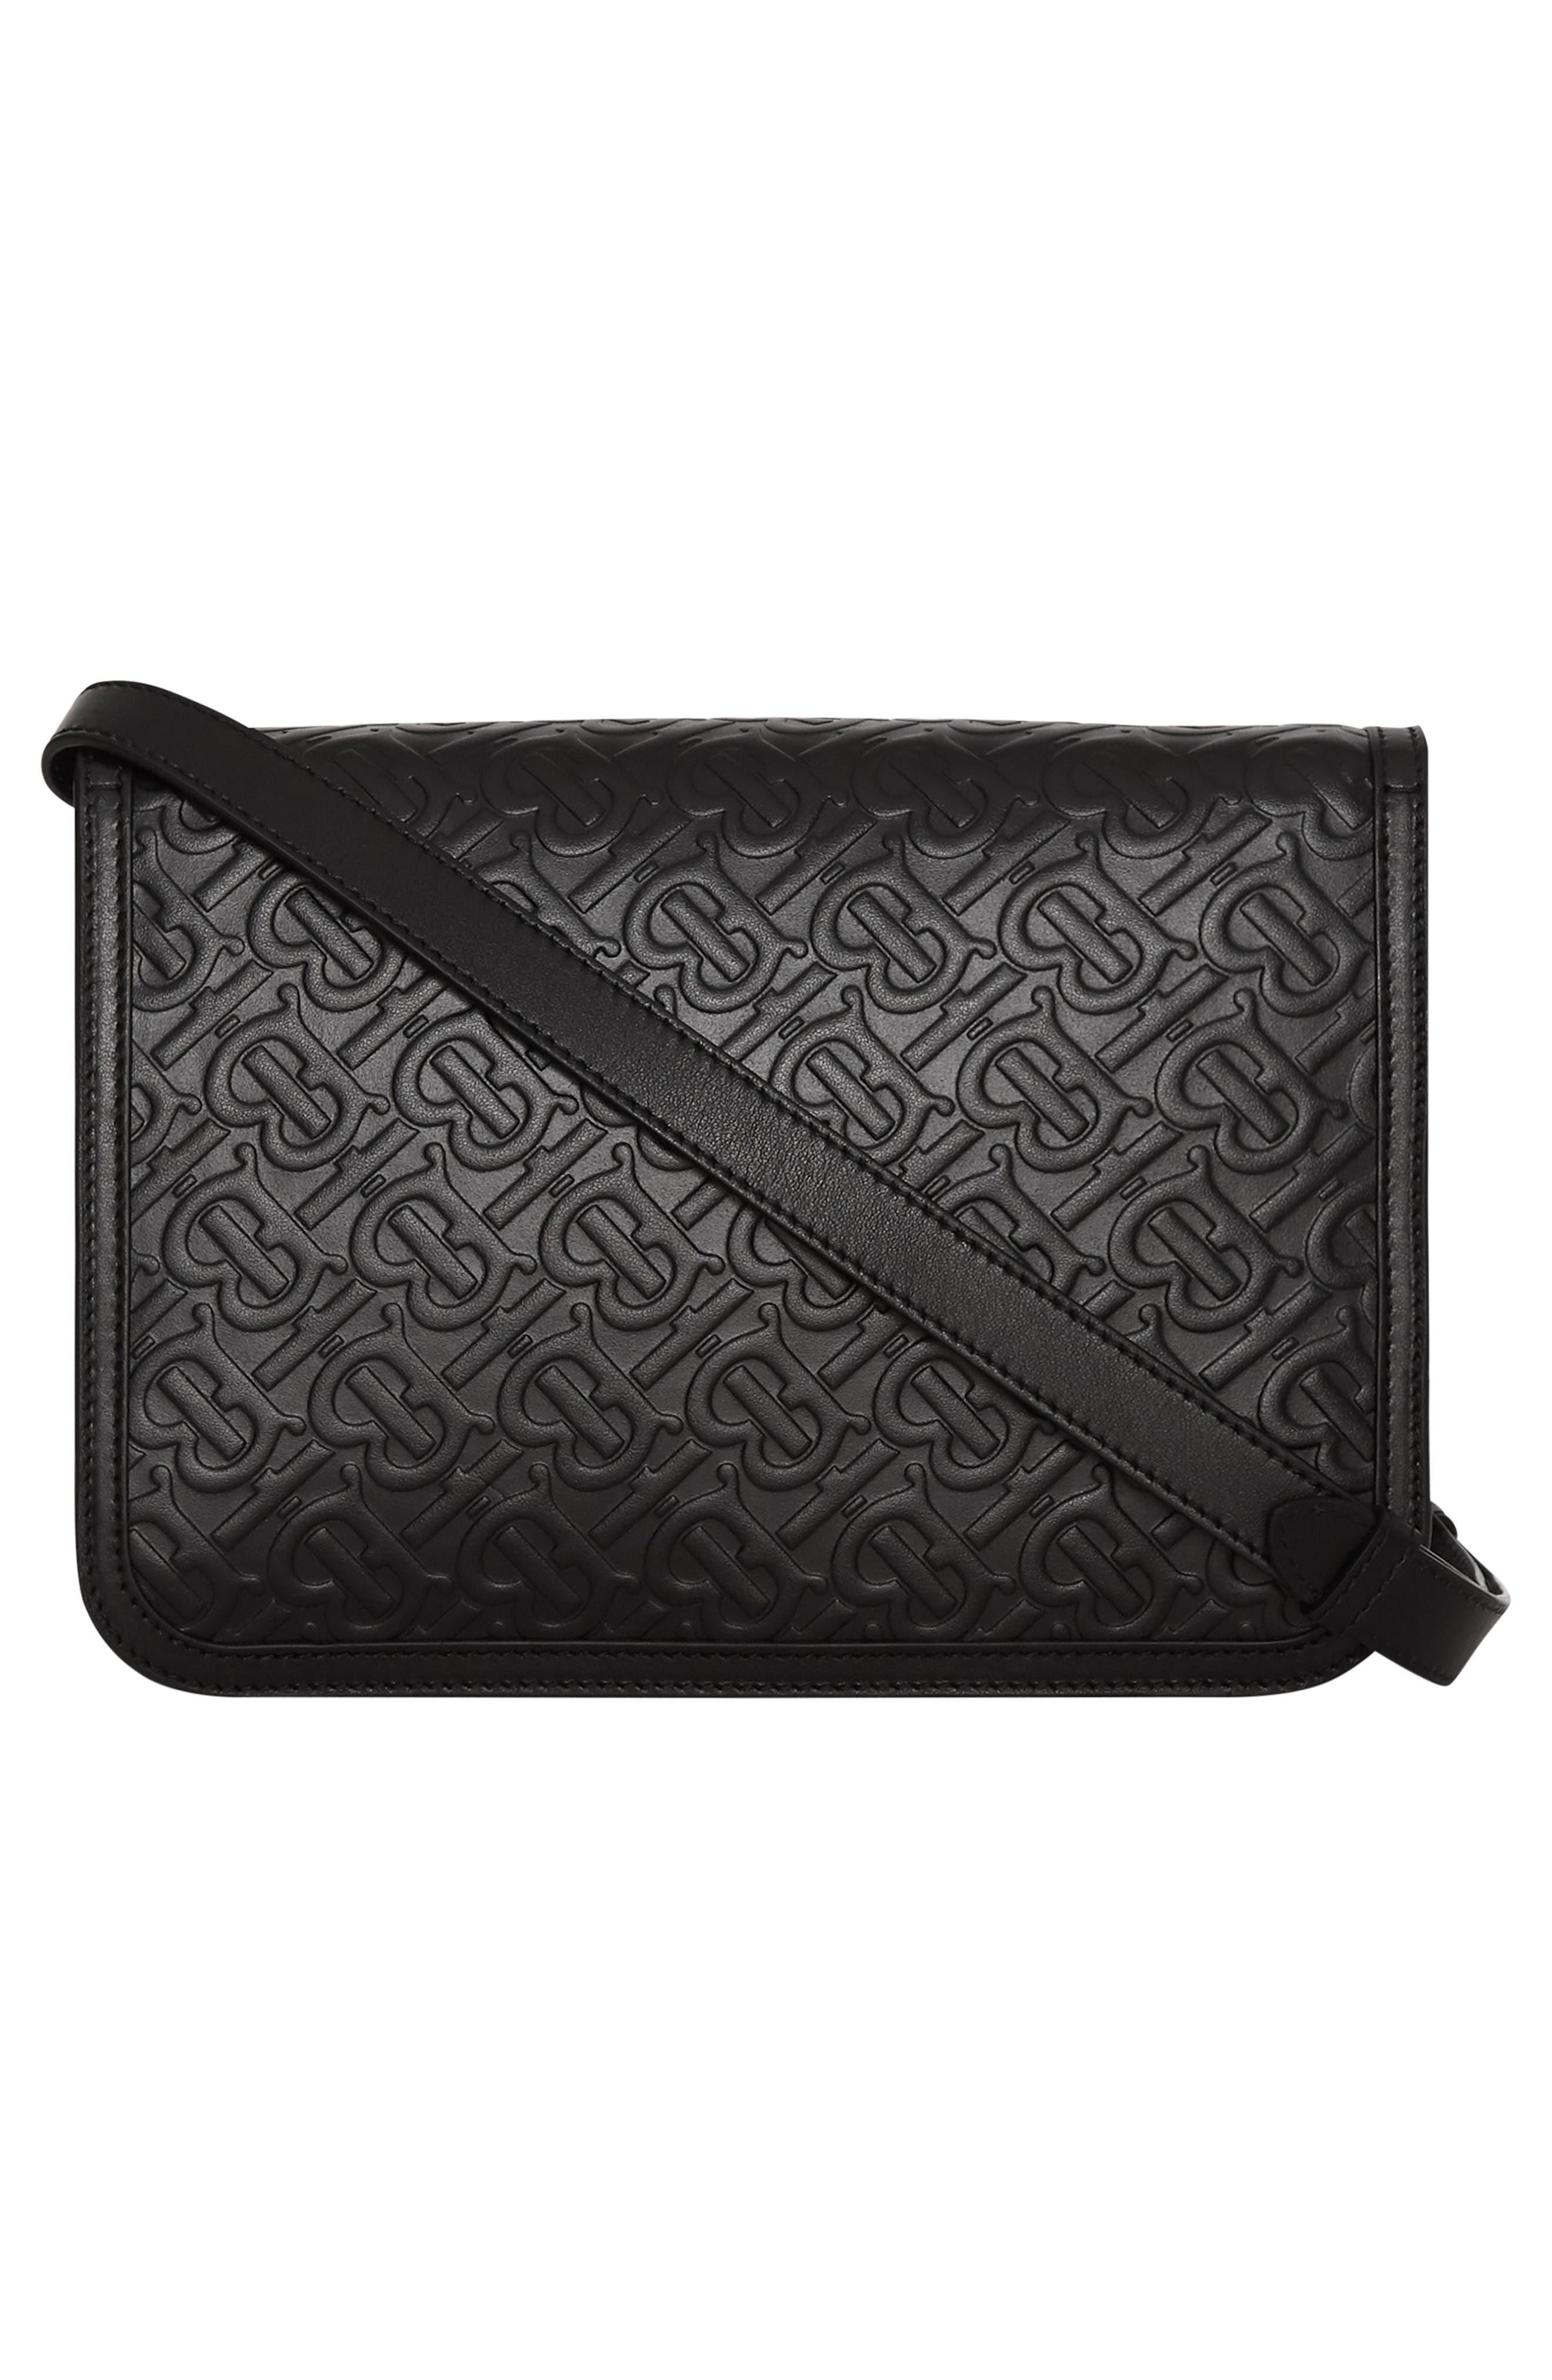 BURBERRY, Medium TB Monogram Leather Bag, Alternate thumbnail 4, color, BLACK